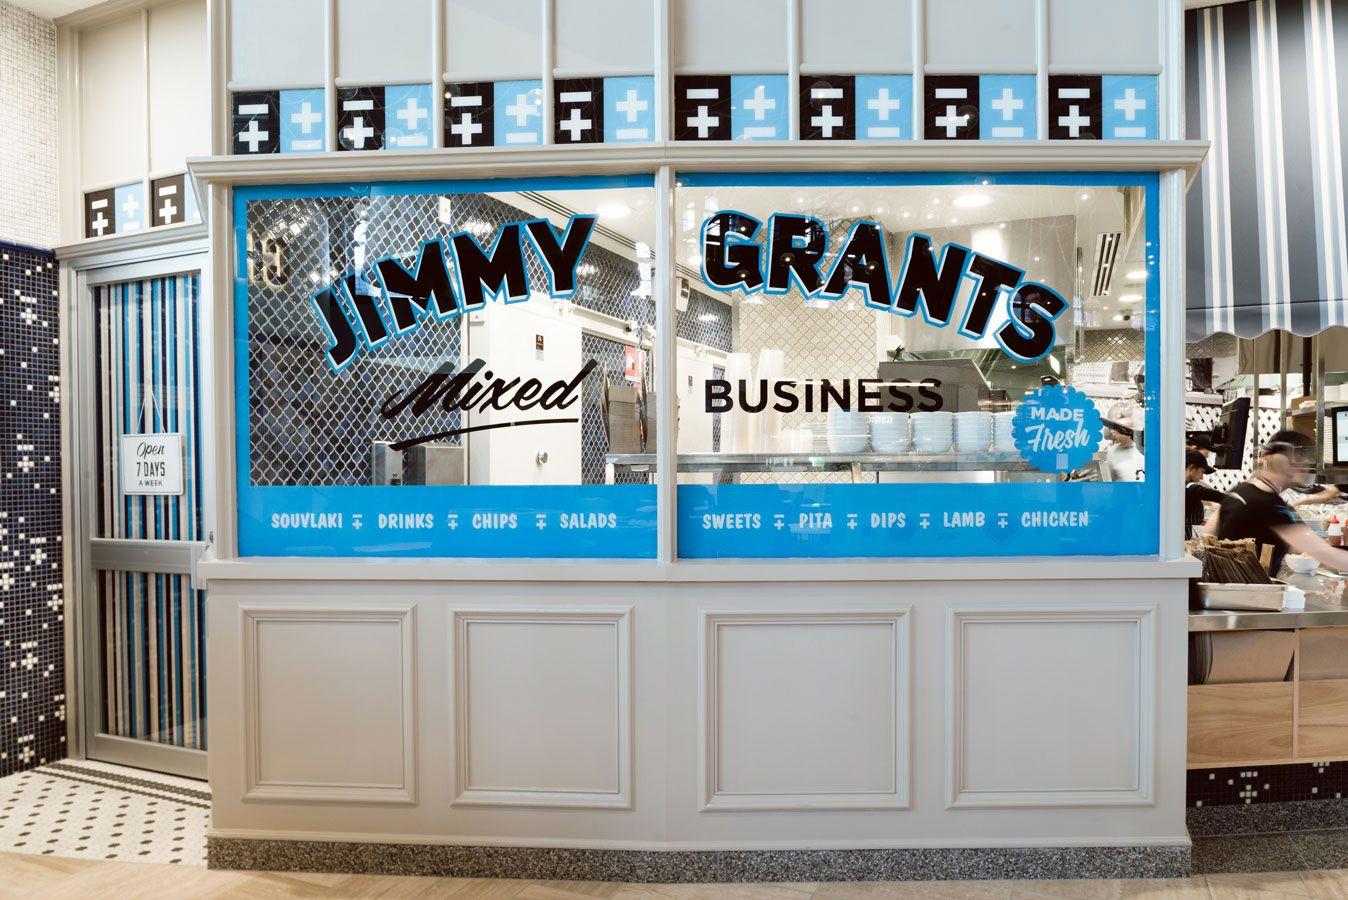 Jimmy Grants Emporium | Techne | Little Black Bird | Pinterest ...